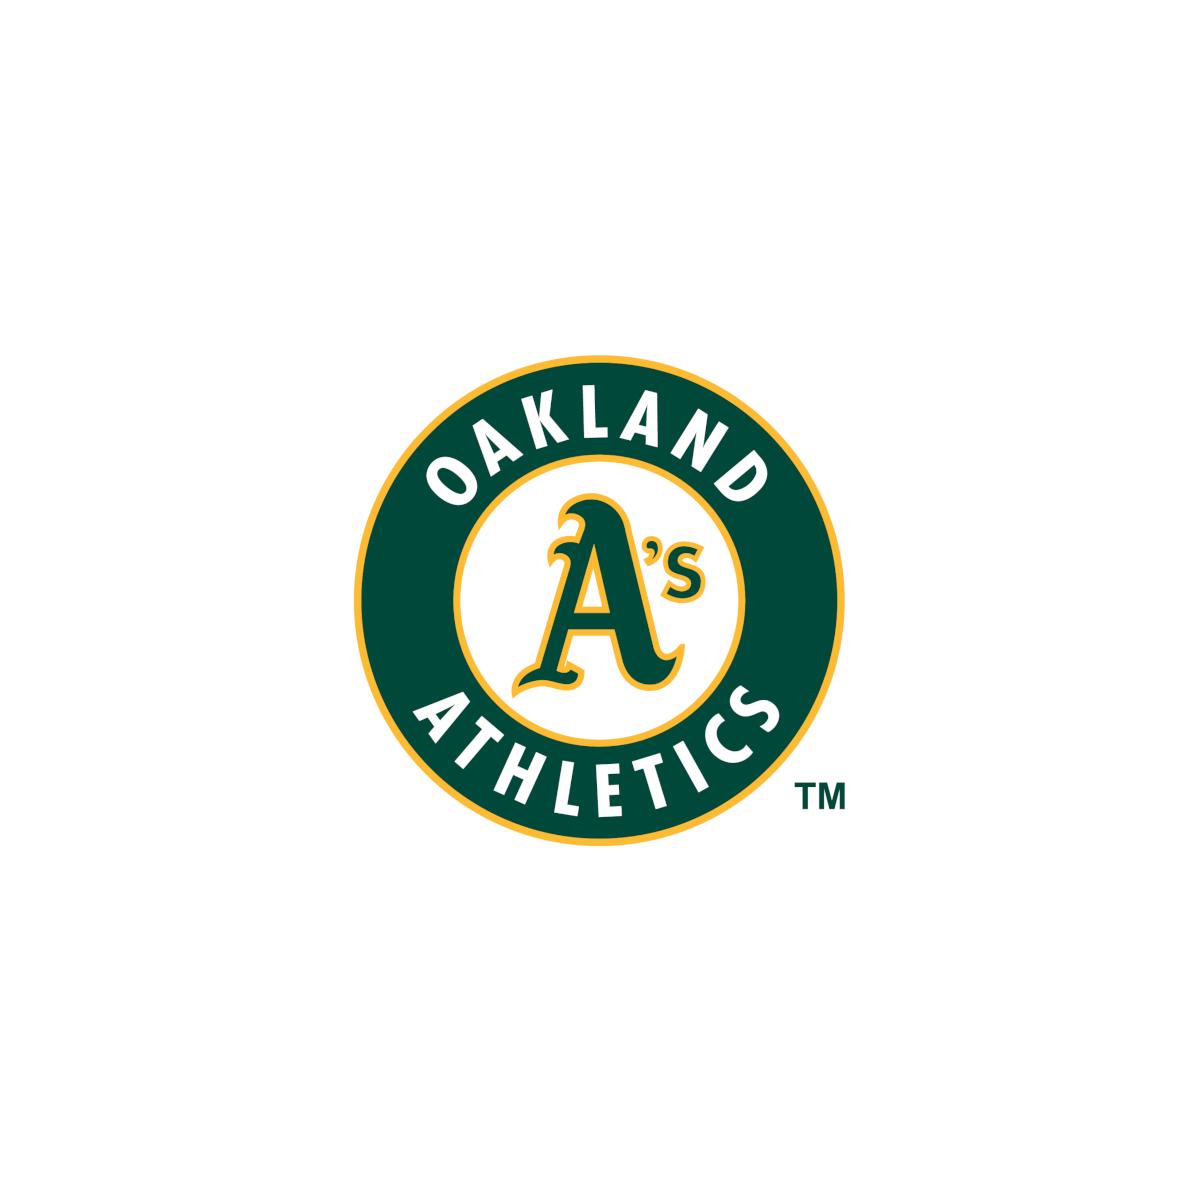 OAK_As_circle_logo.png